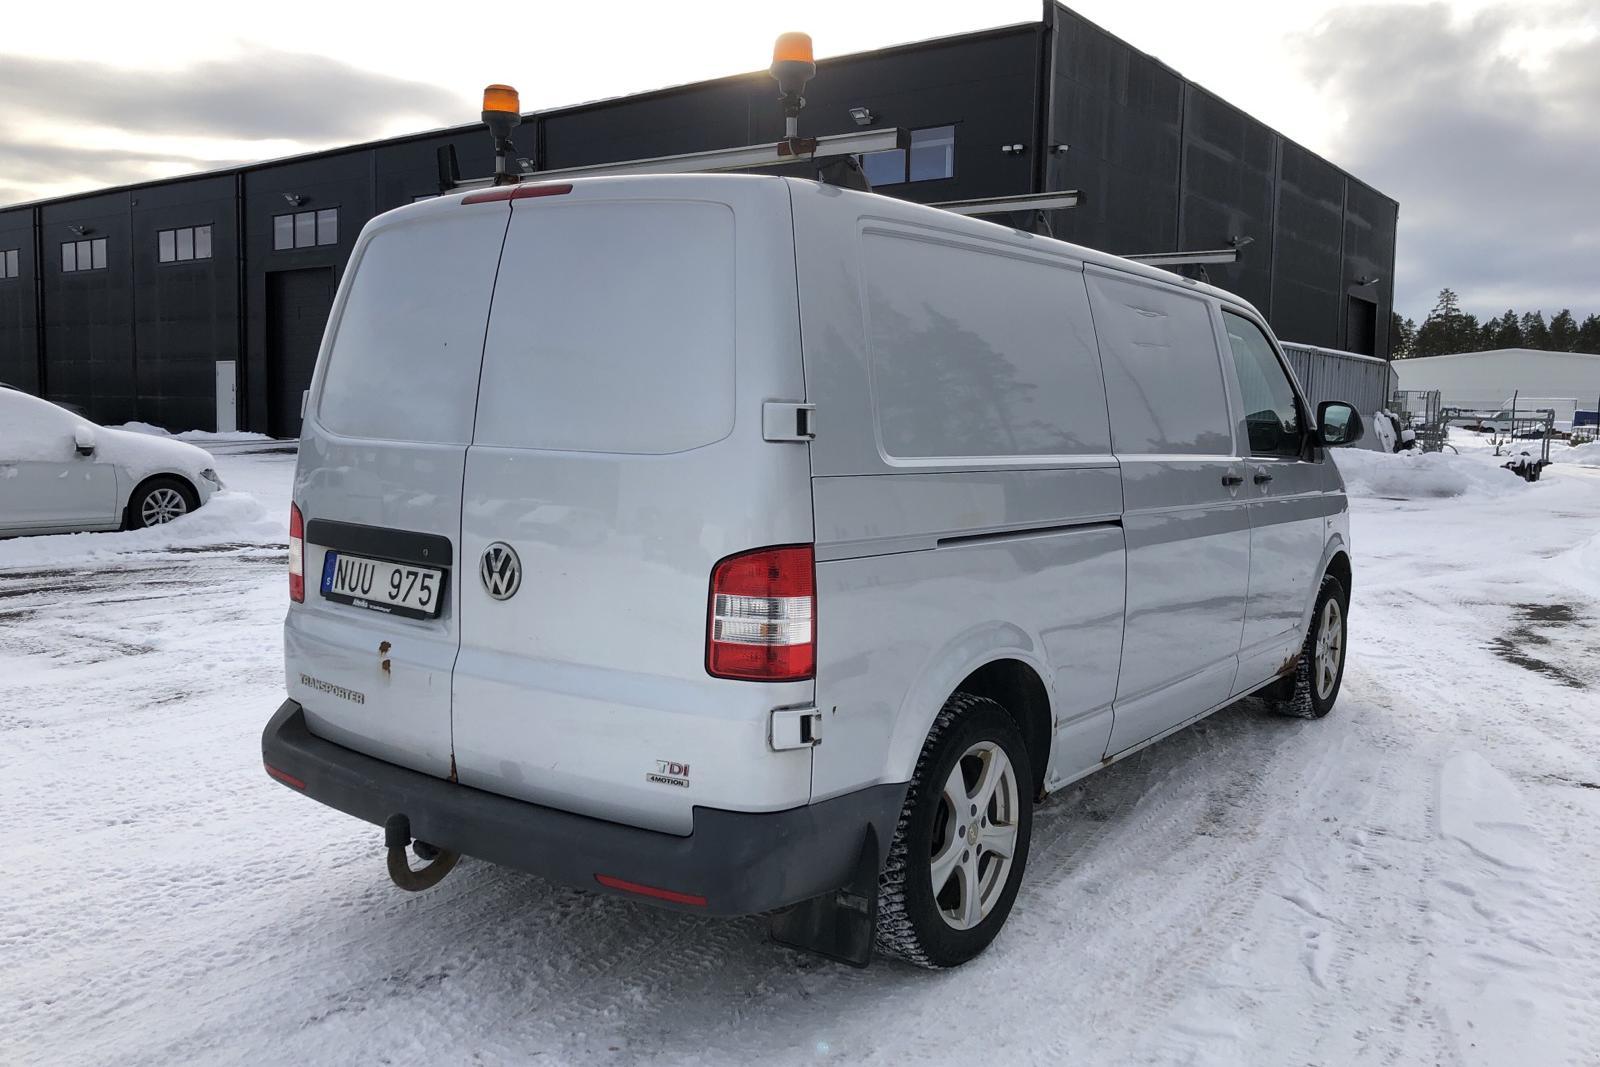 VW Transporter T5 2.0 TDI 4MOTION (180hk) - 163 130 km - Manual - silver - 2013